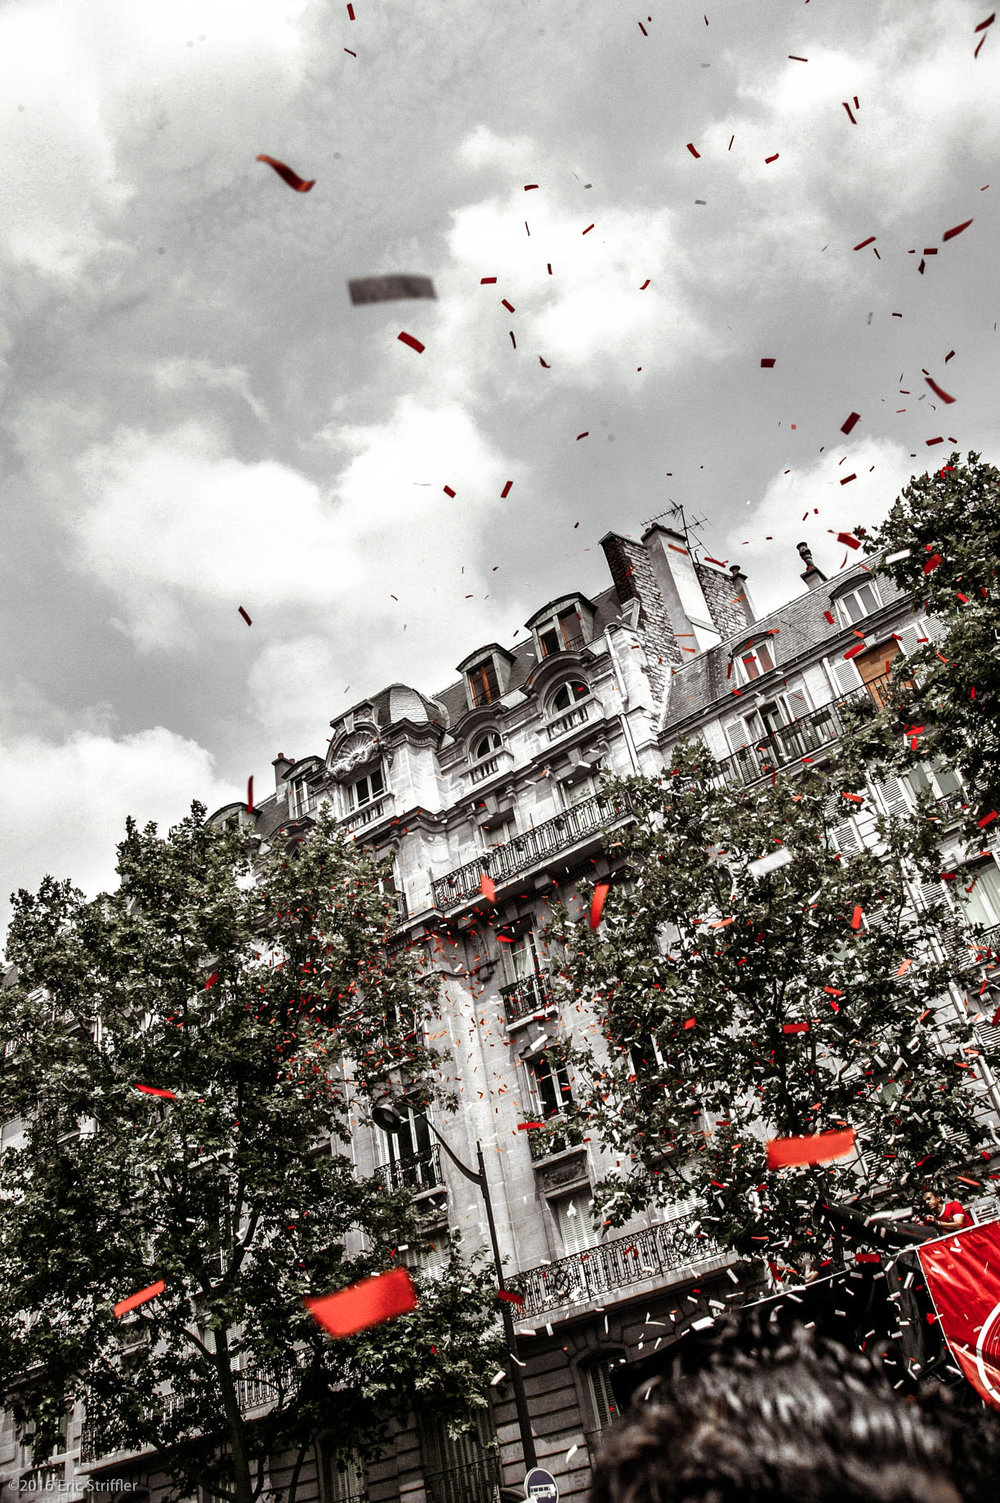 eric_striffler_photography_travel-77.jpg